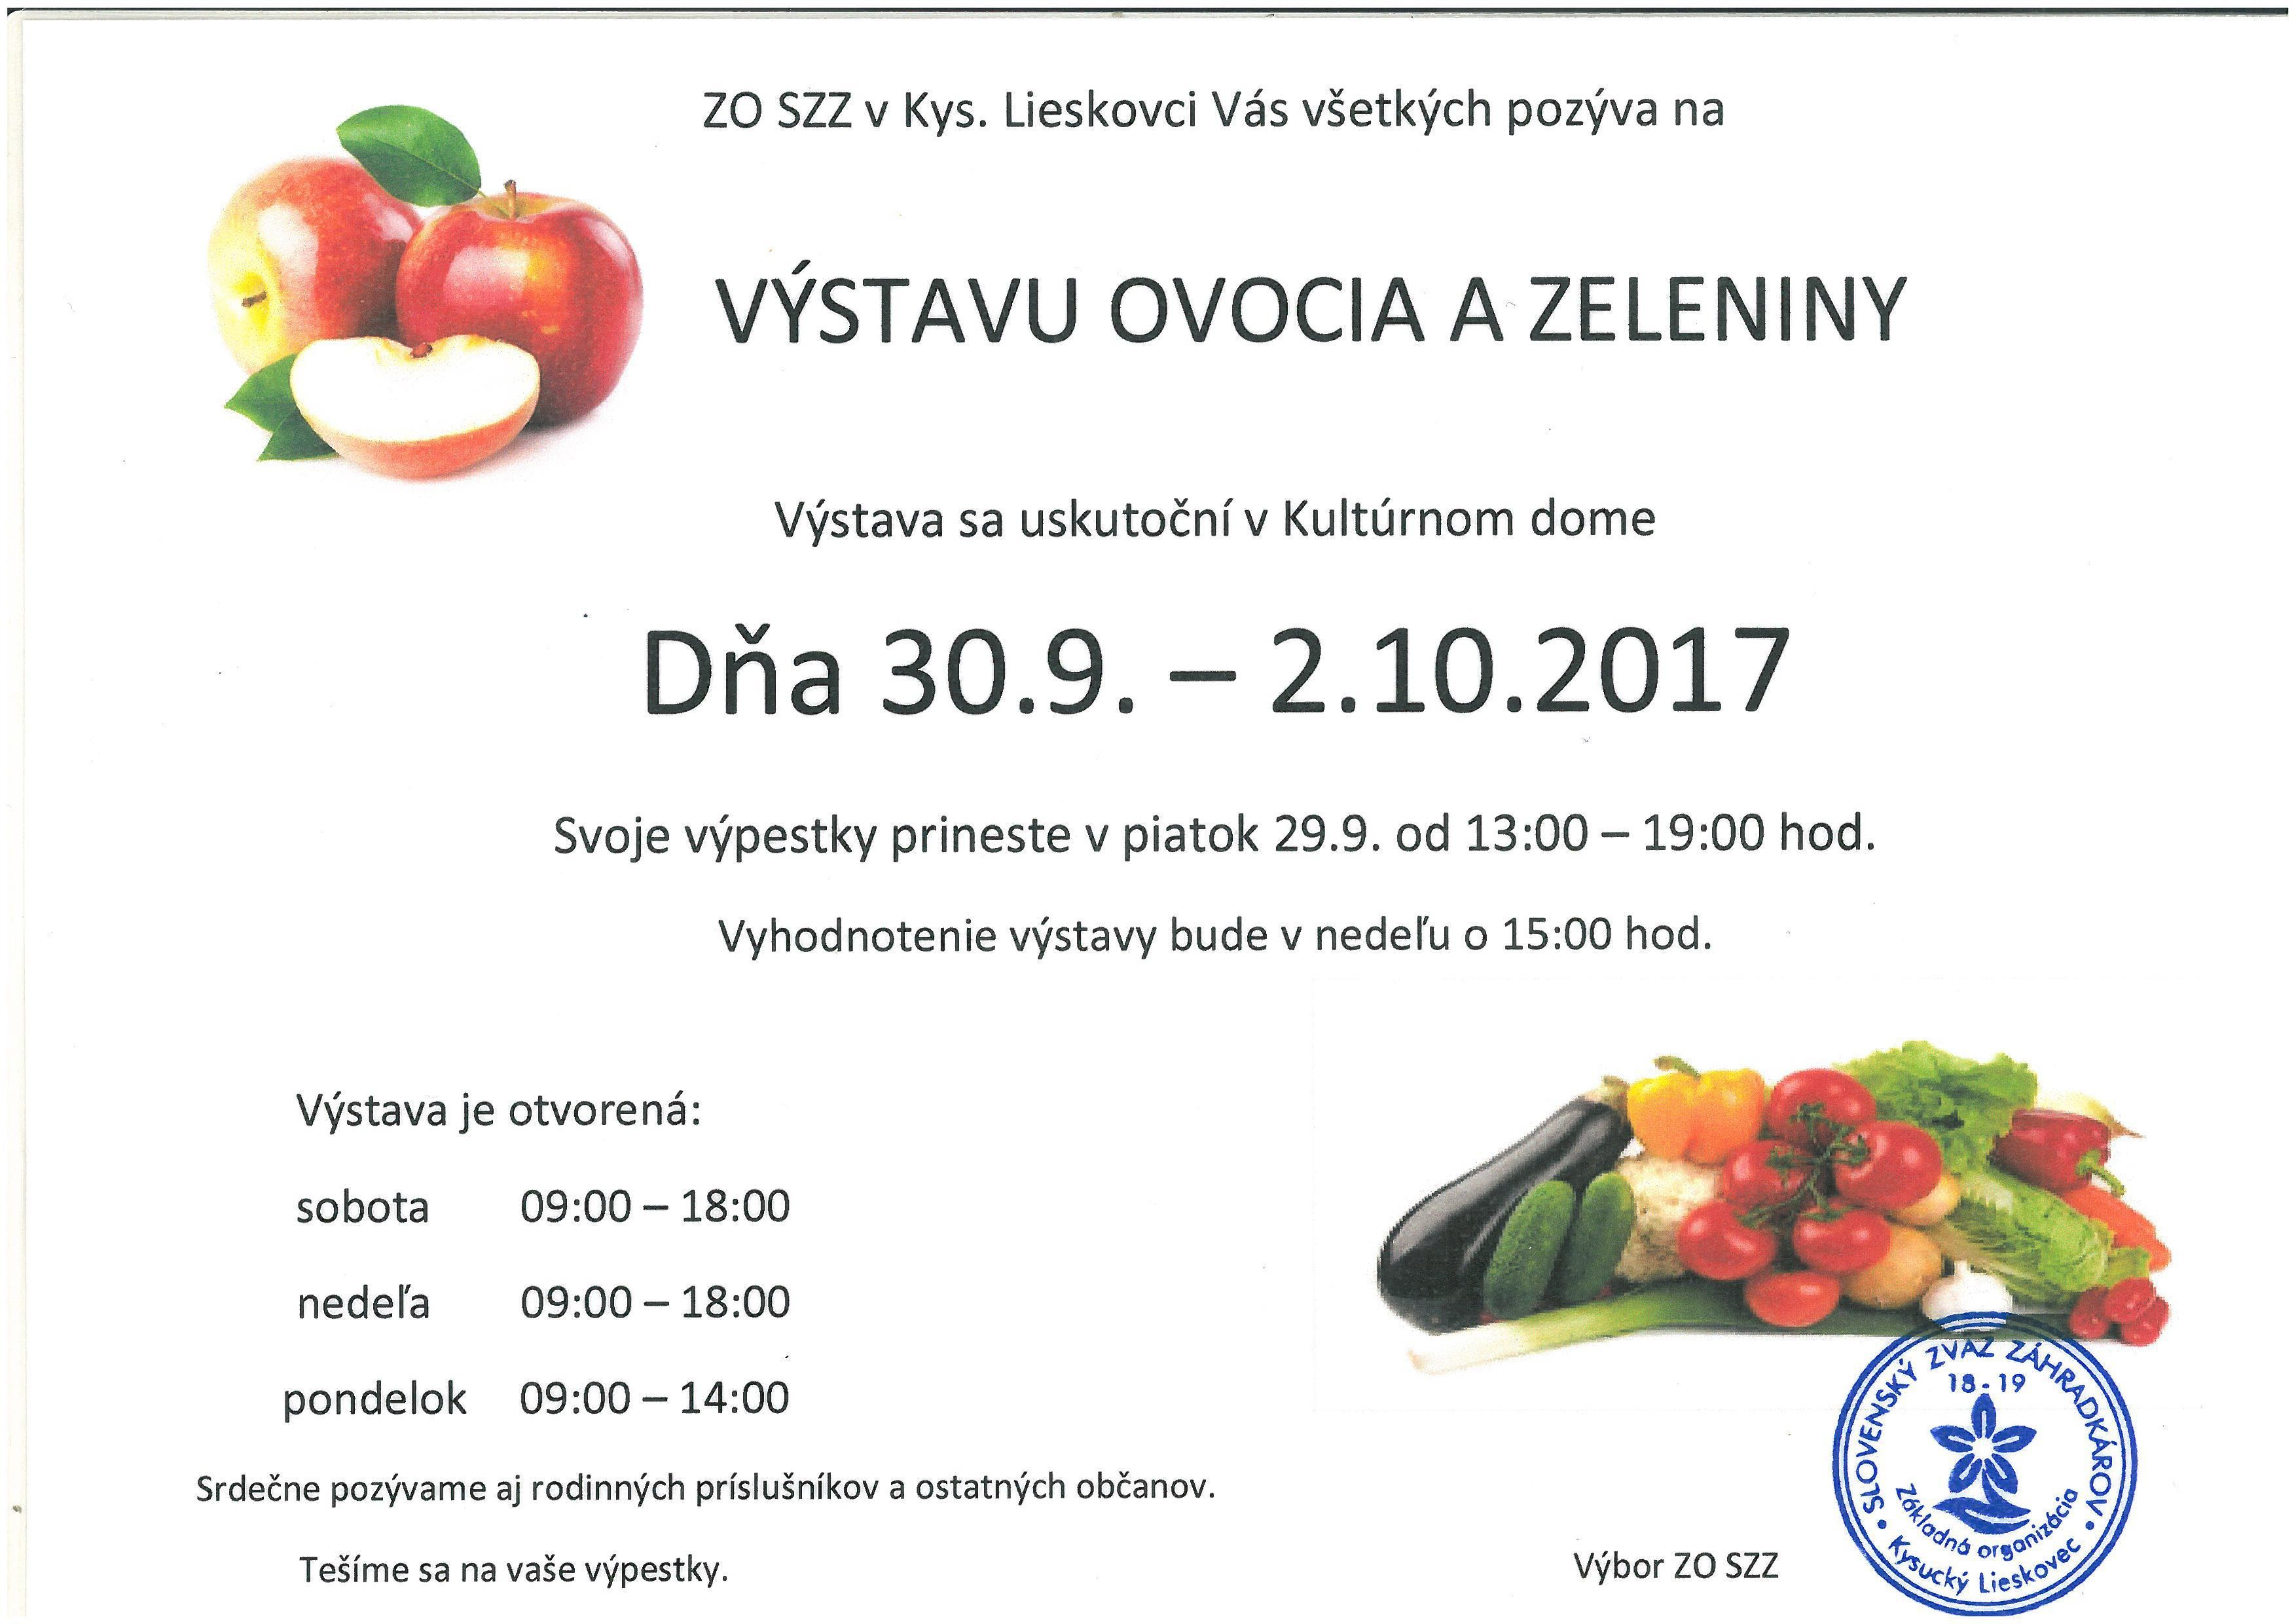 Pozvánka na výstavu ovocia a zeleniny v obci Kysucký Lieskovec